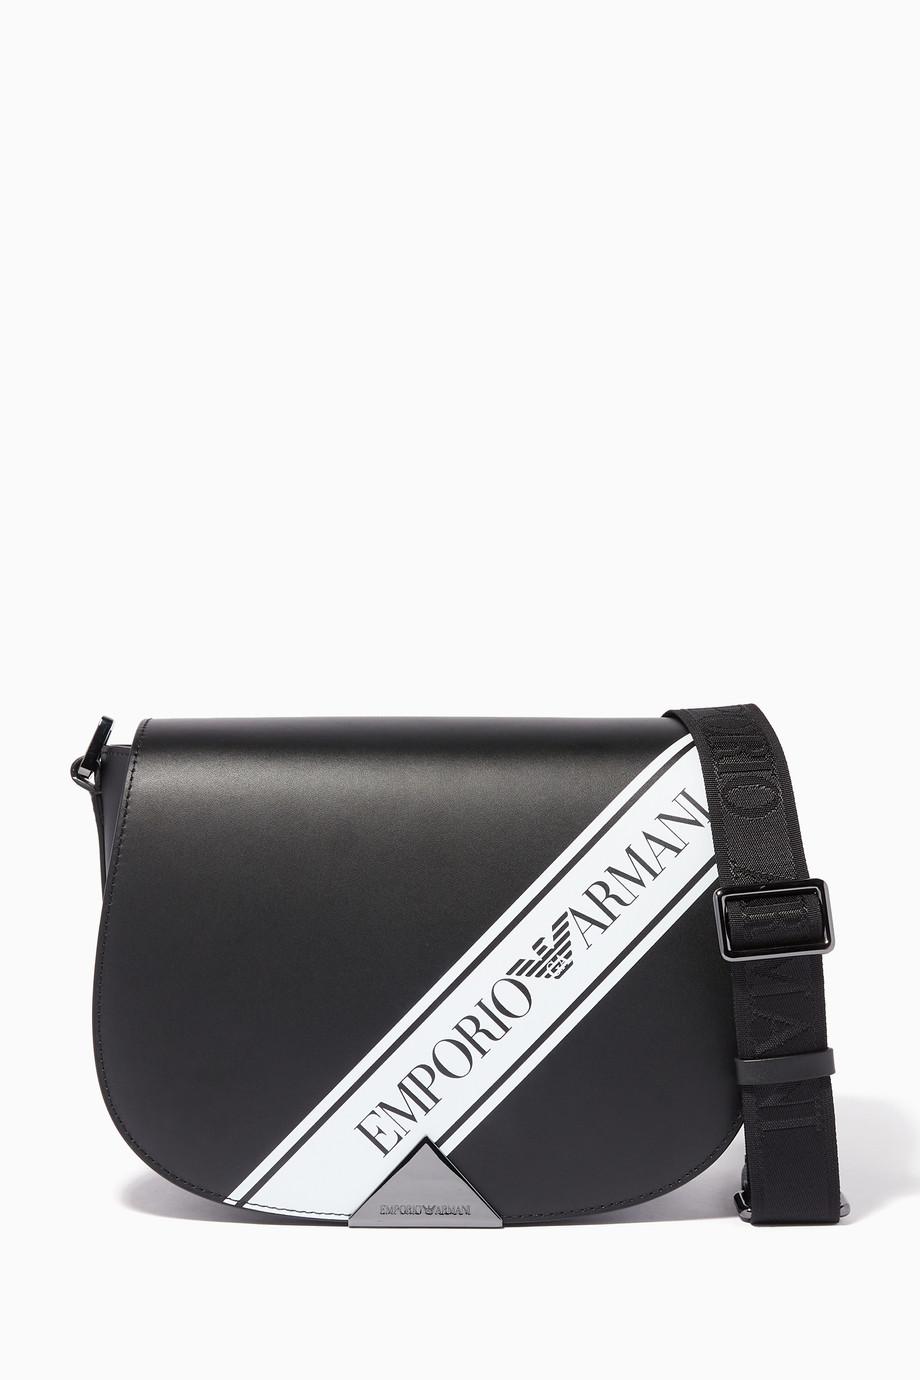 7837350bea Shop Emporio Armani Black Peggy Crossbody Bag for Women   Ounass Saudi